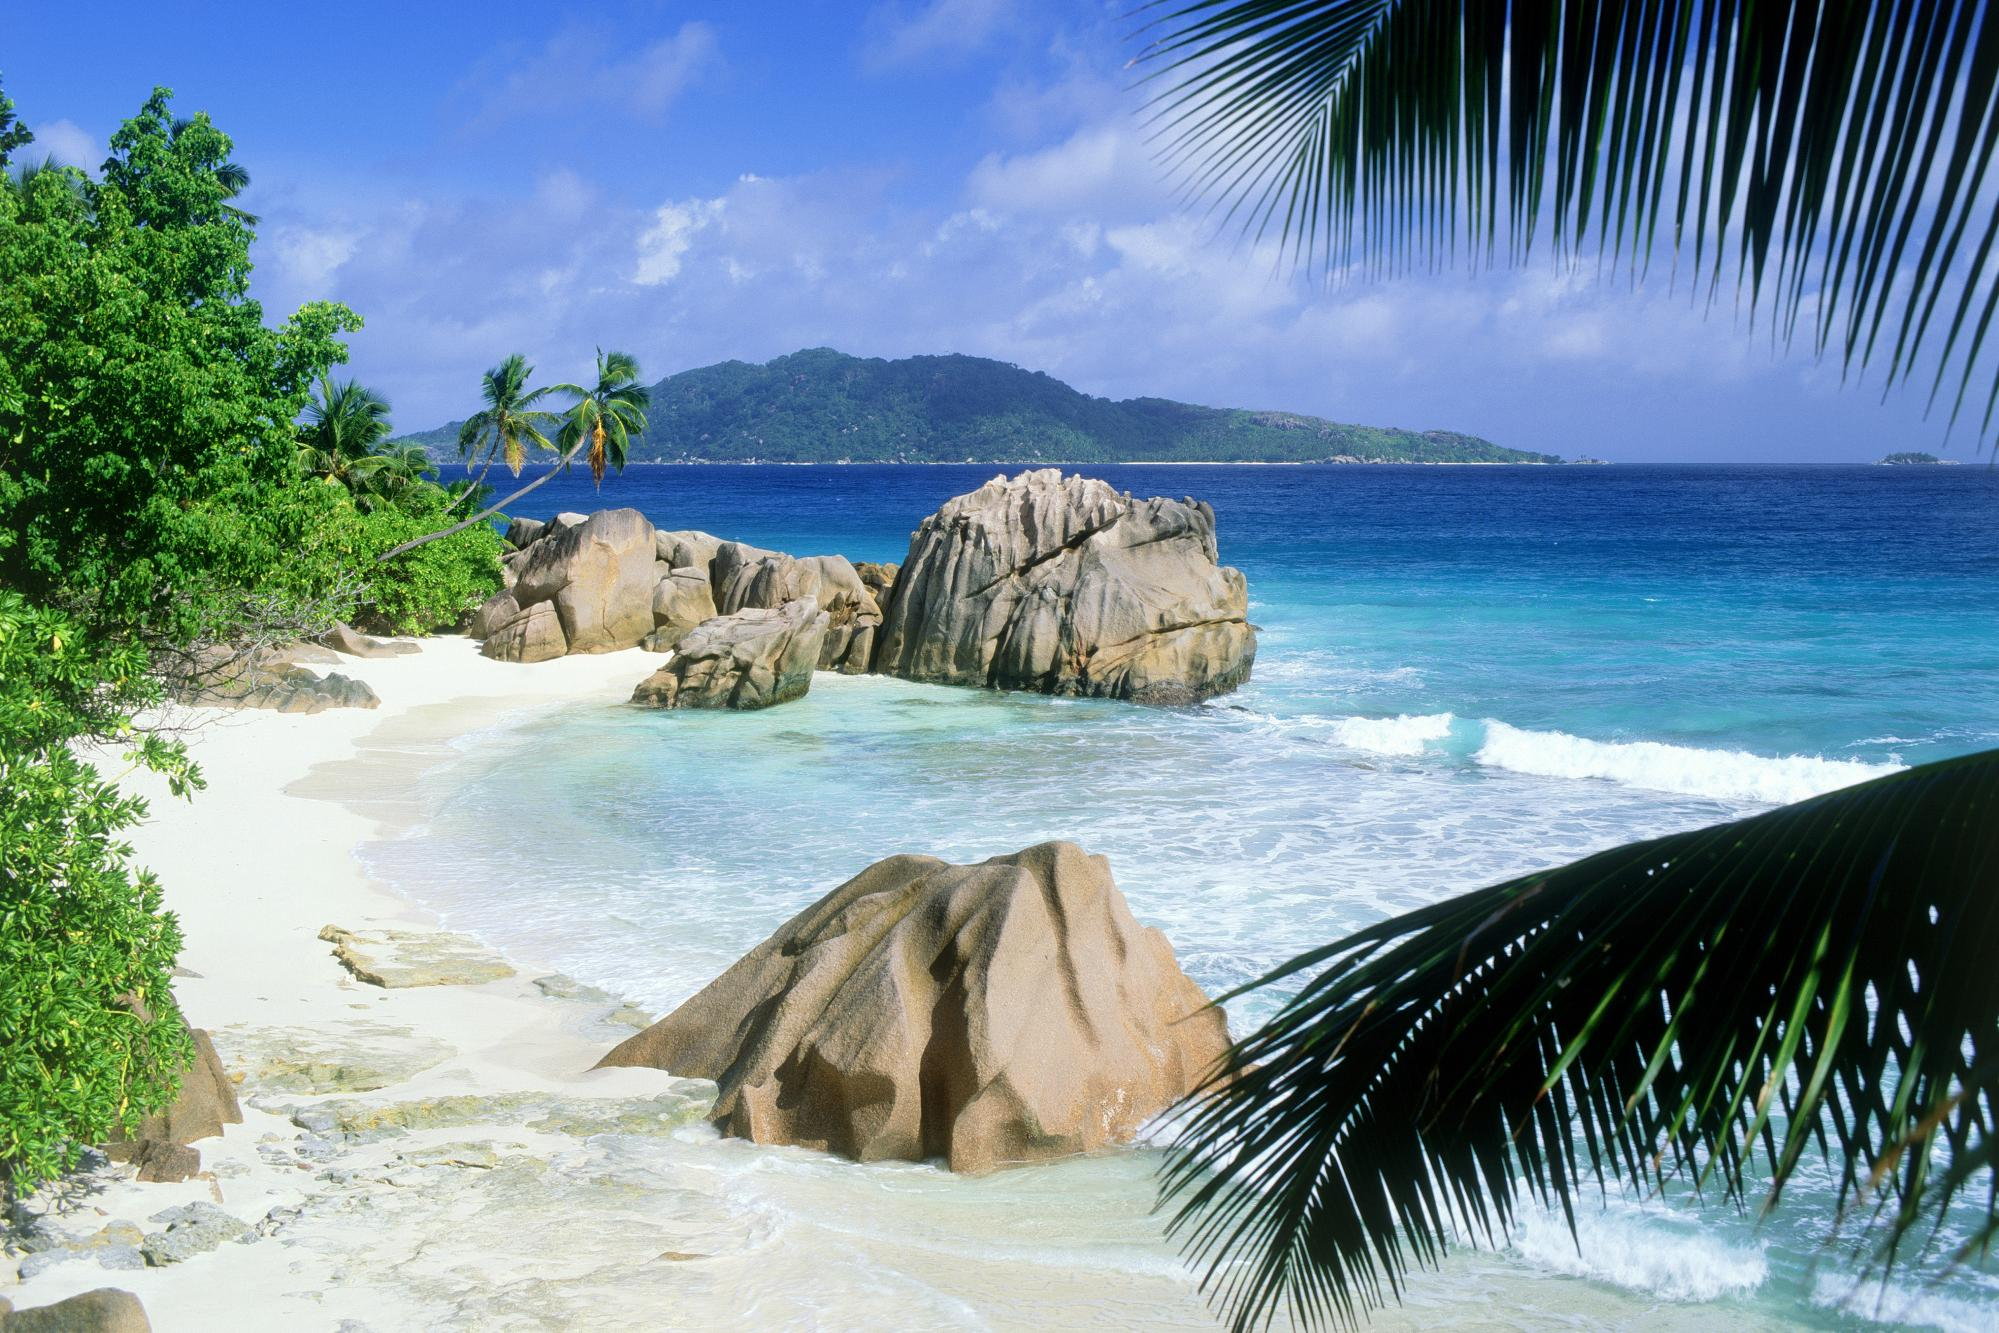 Sfondi desktop paesaggi hd spiaggia deserta sfondi hd for Paesaggi desktop